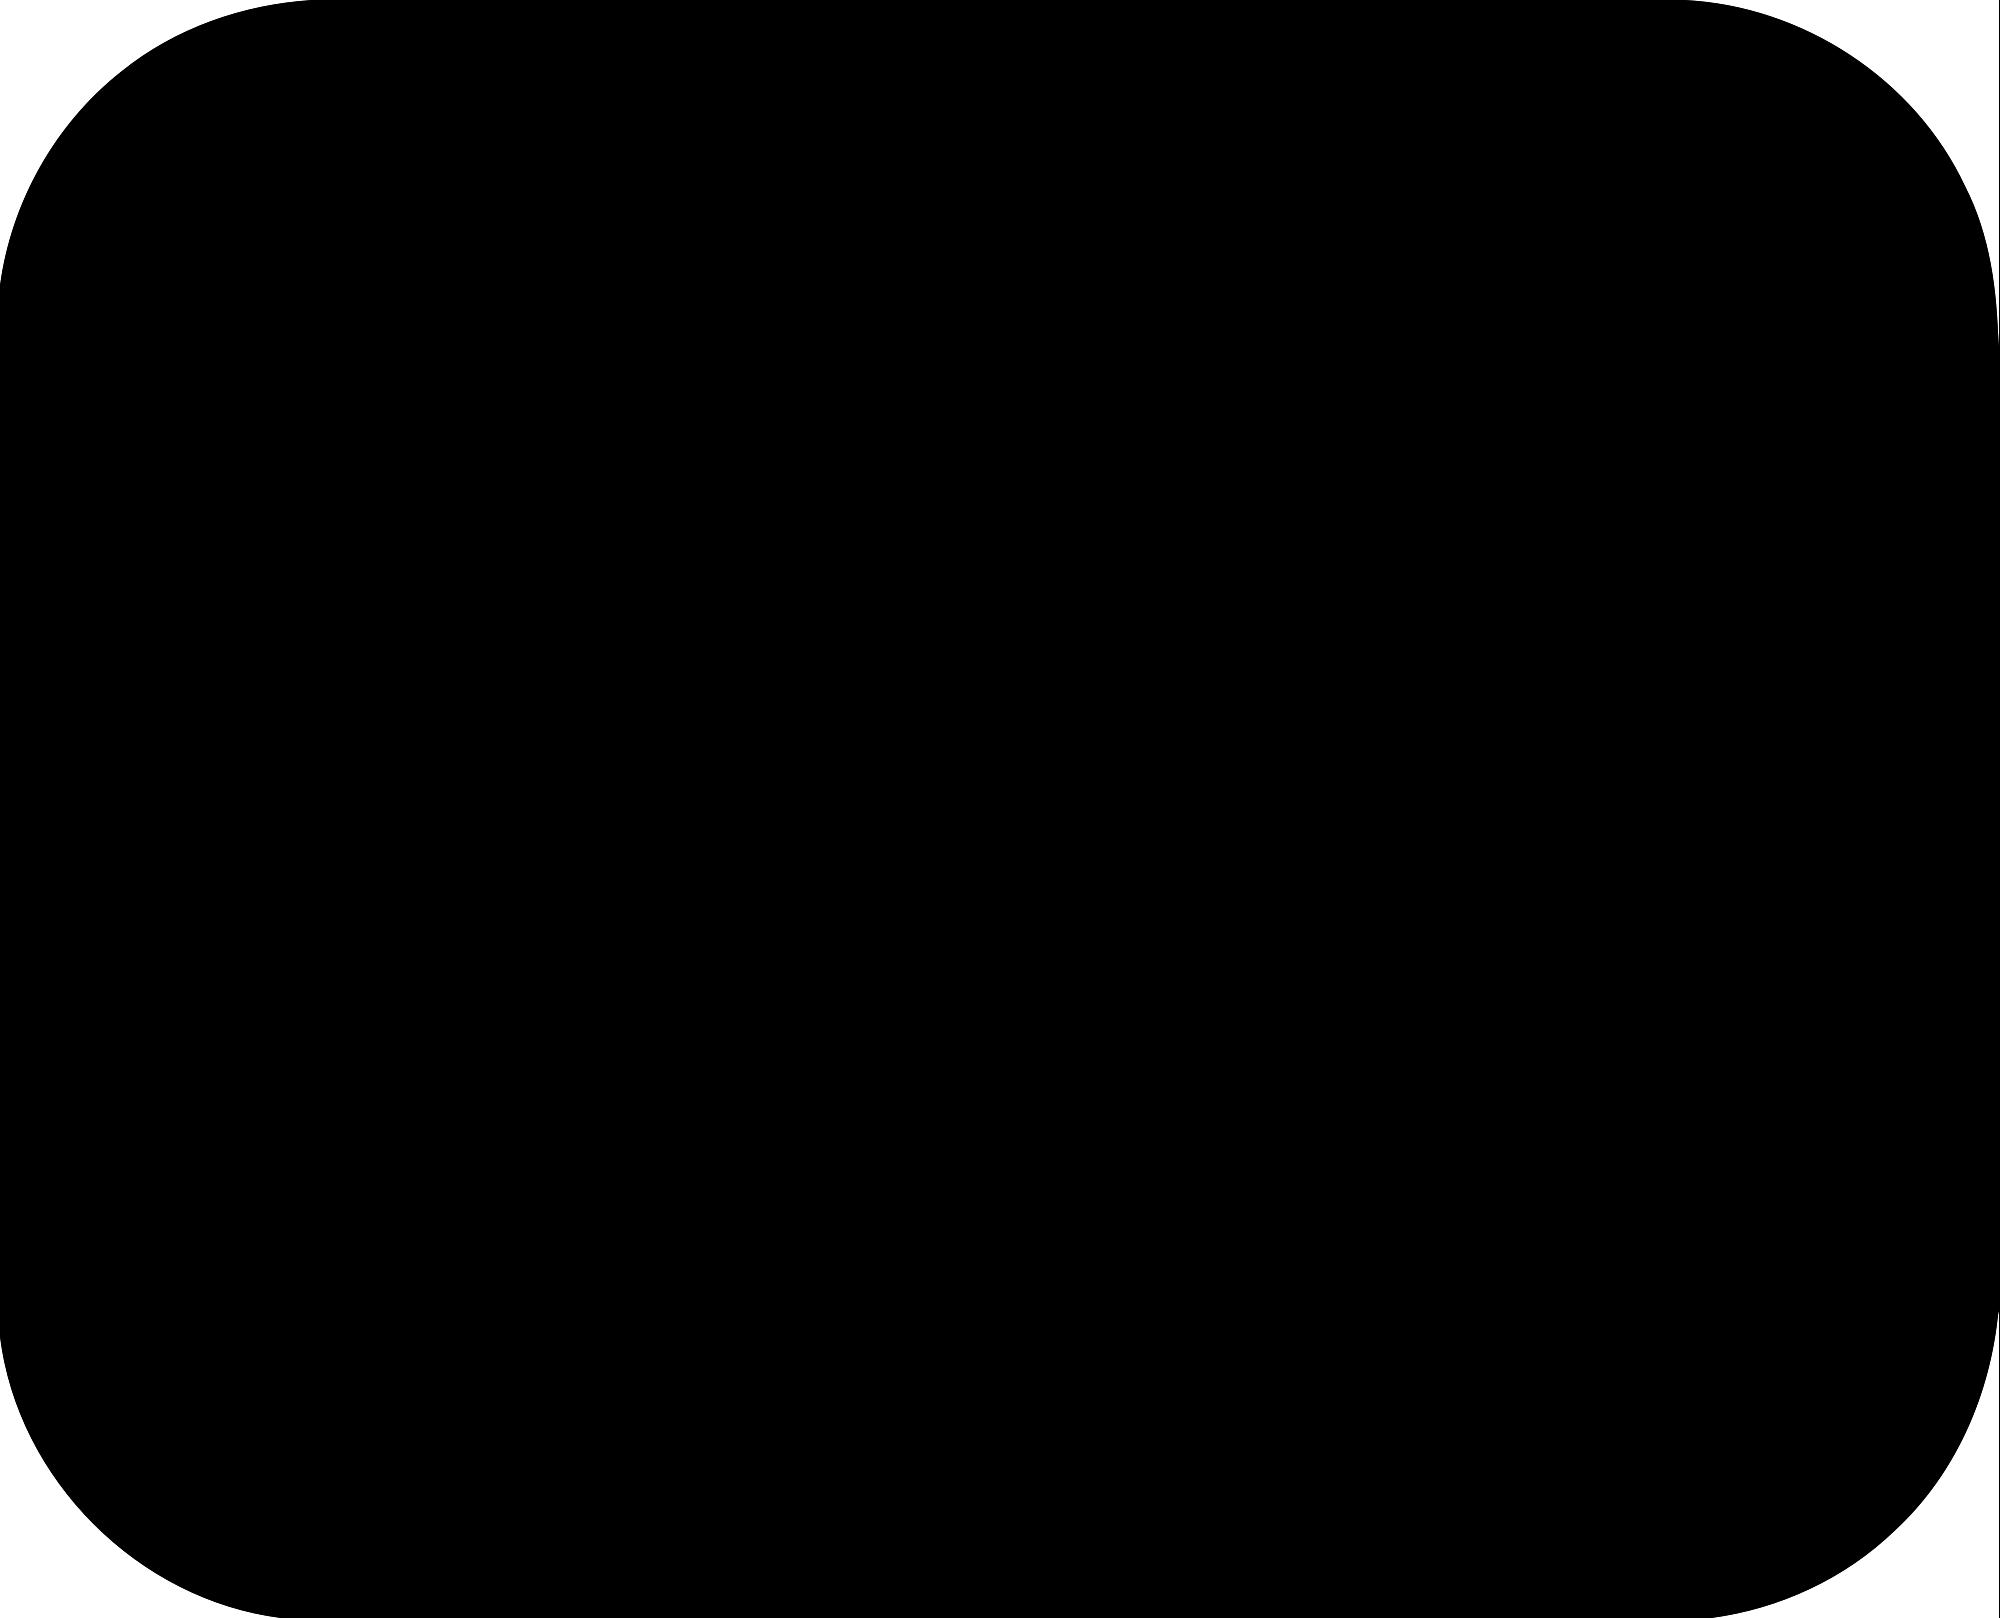 2000px-Glock_logo.png